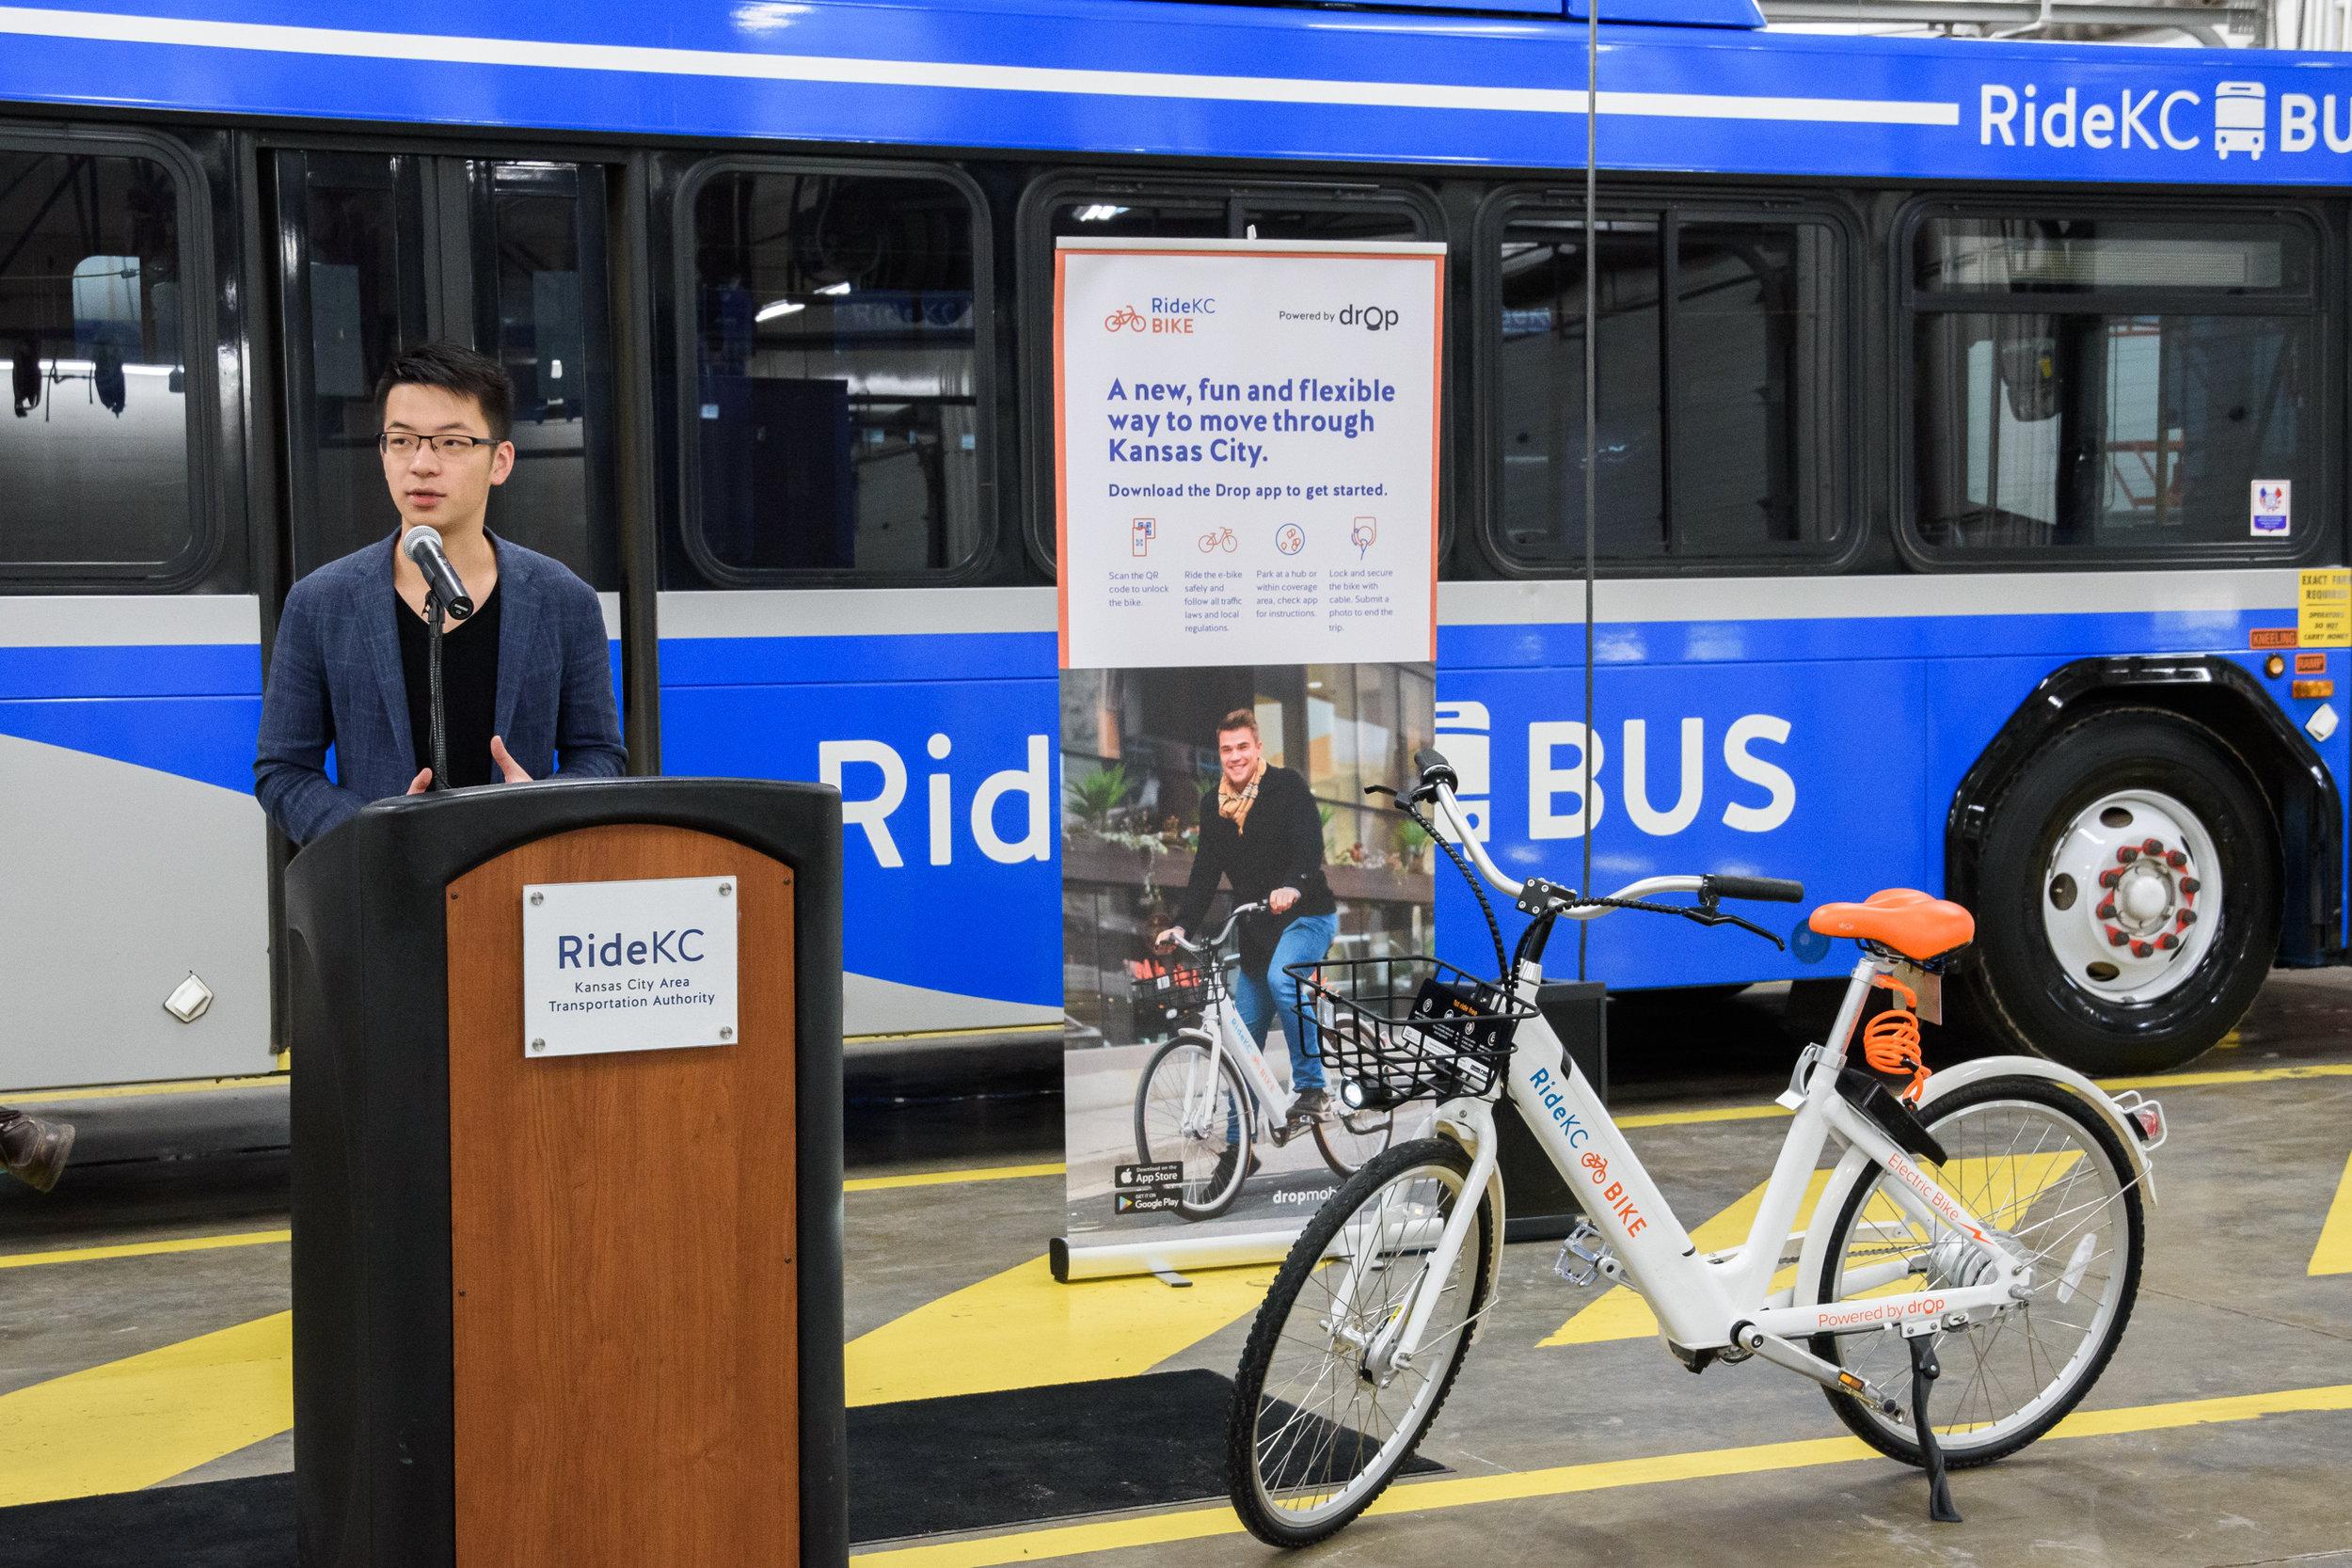 ridekc-bike-launch-event_45438330804_o.jpg